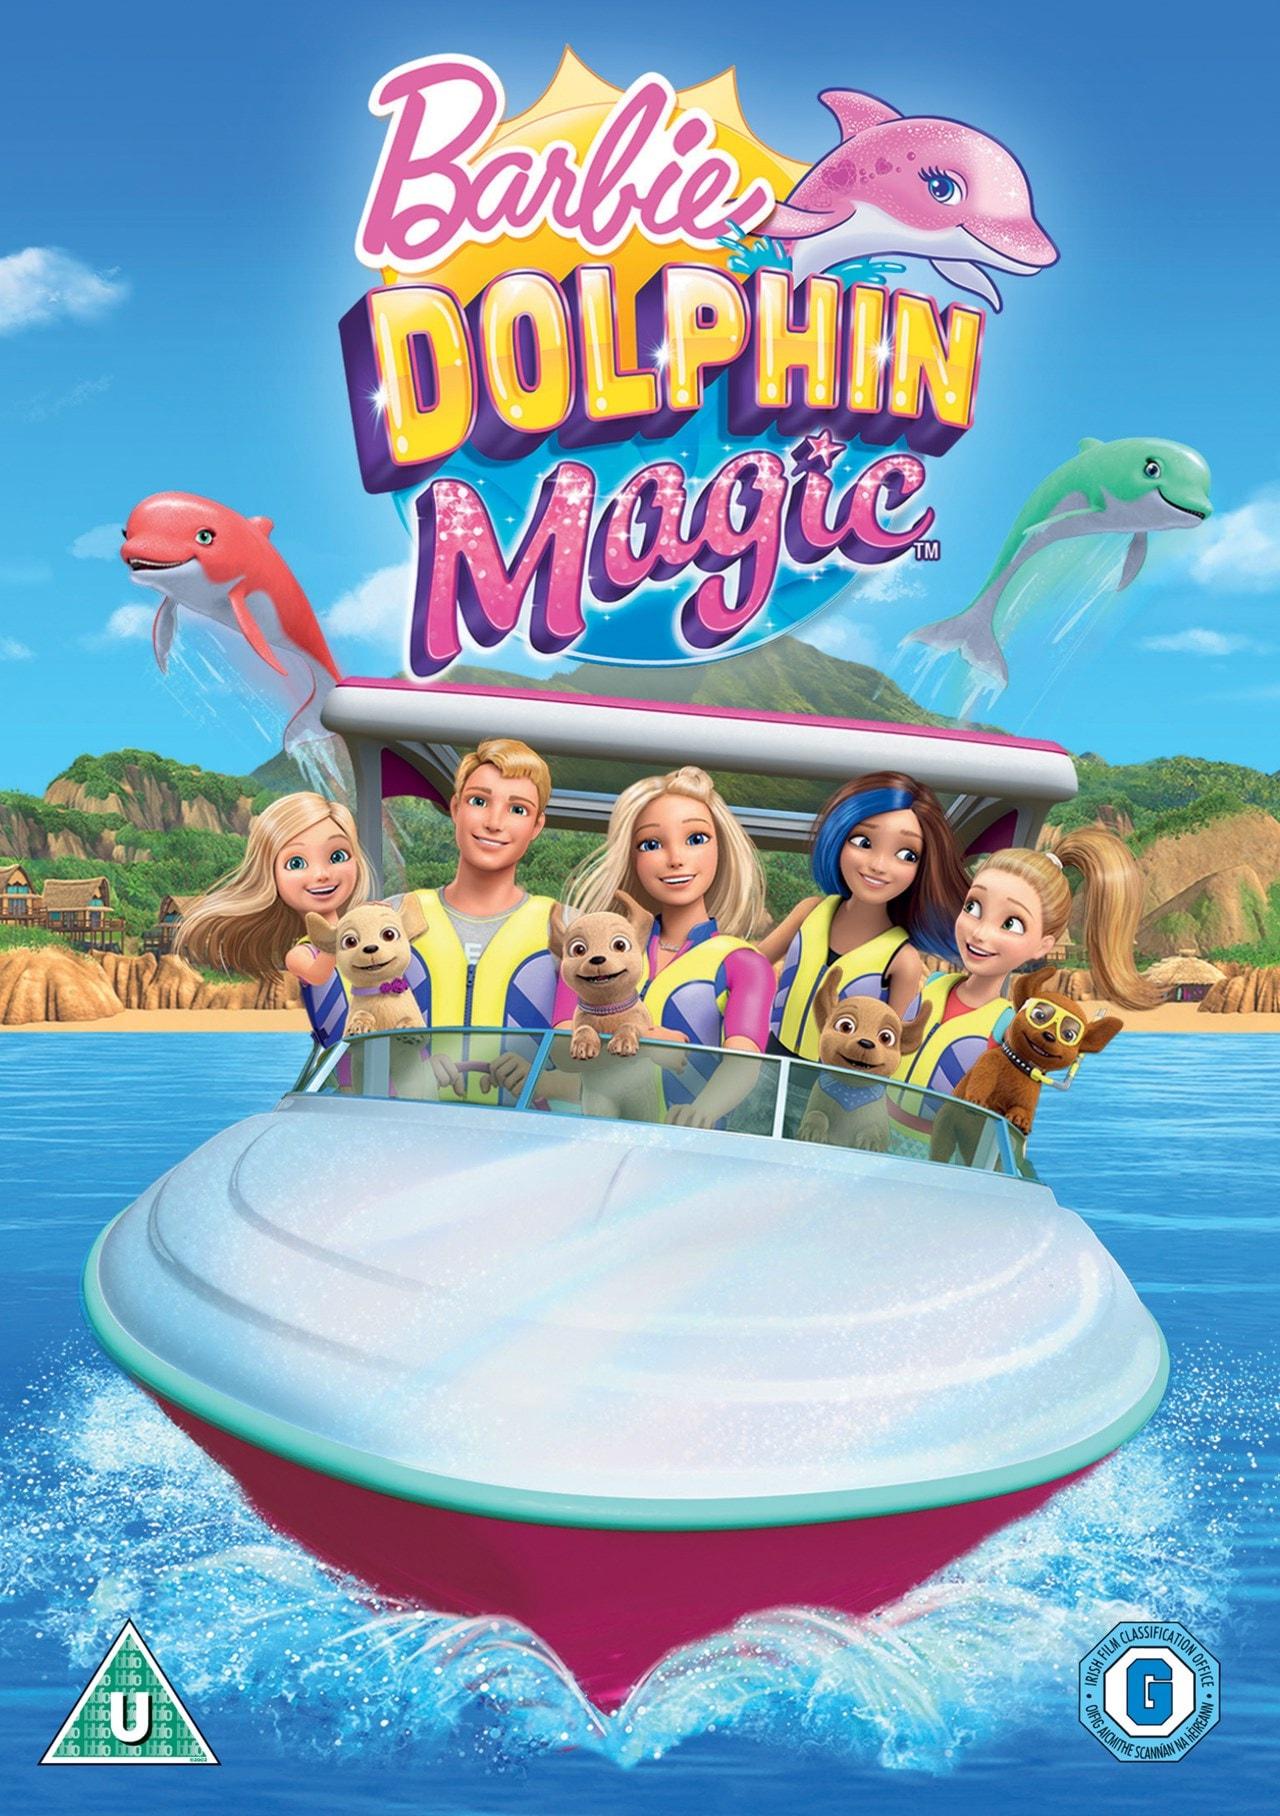 Barbie: Dolphin Magic - 1